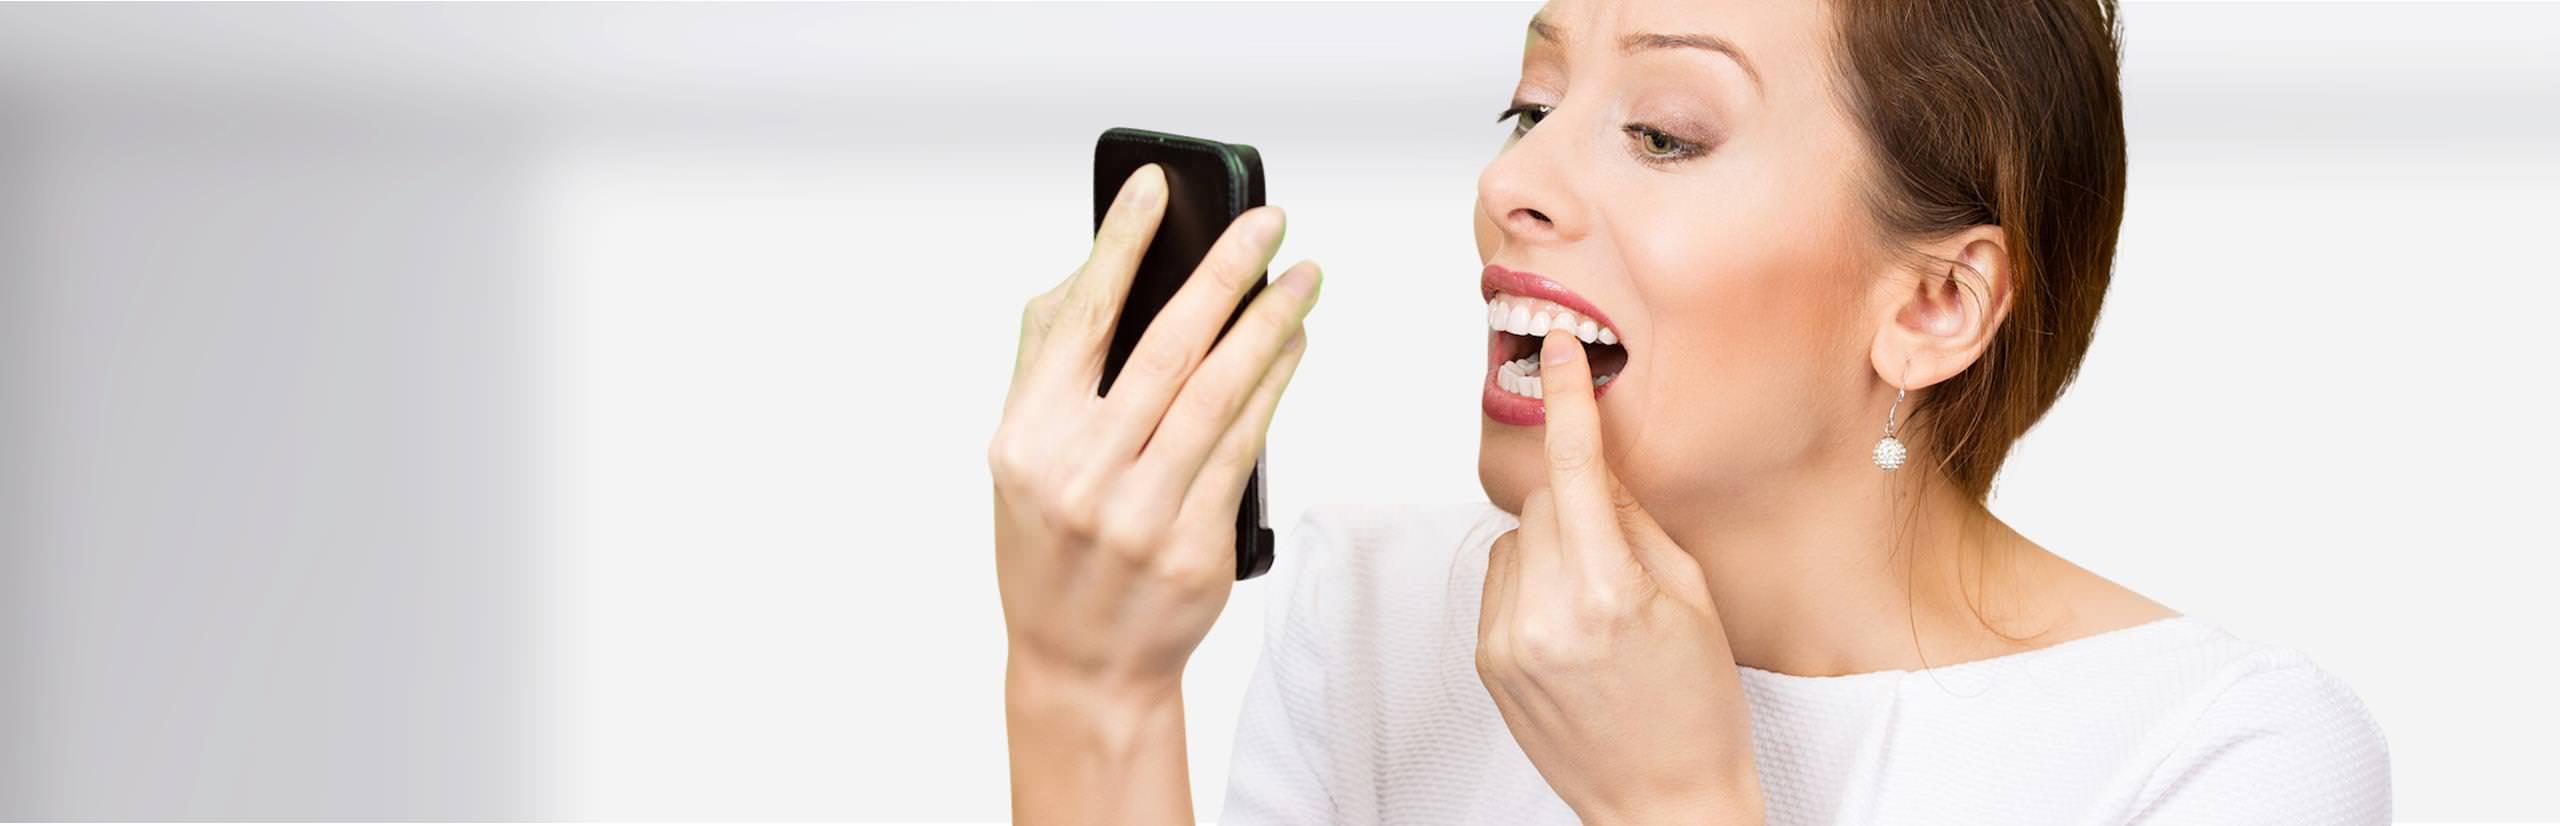 Praxis-Marketing Parodontologie, Pa-Patienten